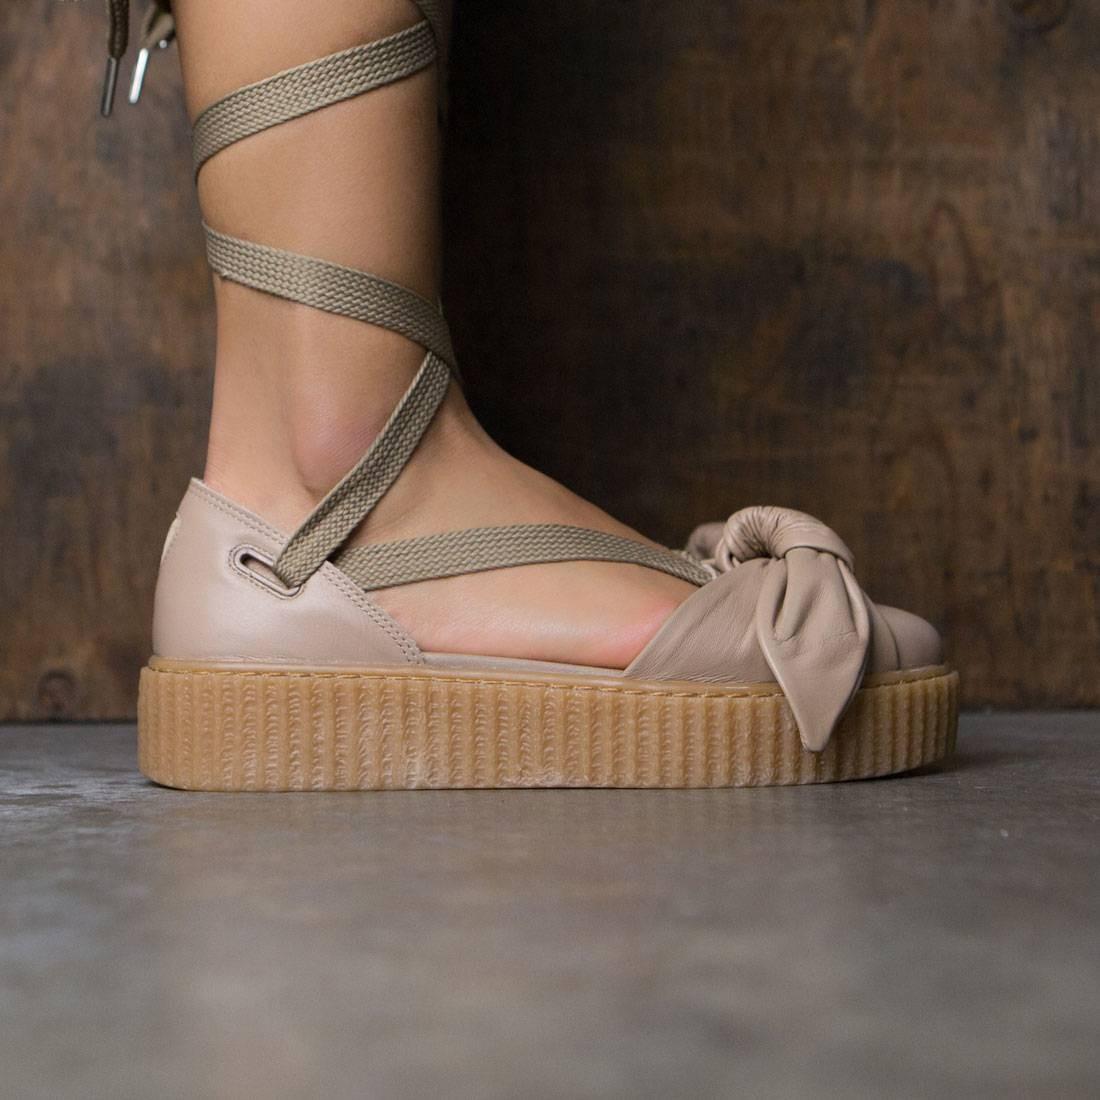 puma x fenty by rihanna women bow creeper sandal natural oatmeal. Black Bedroom Furniture Sets. Home Design Ideas